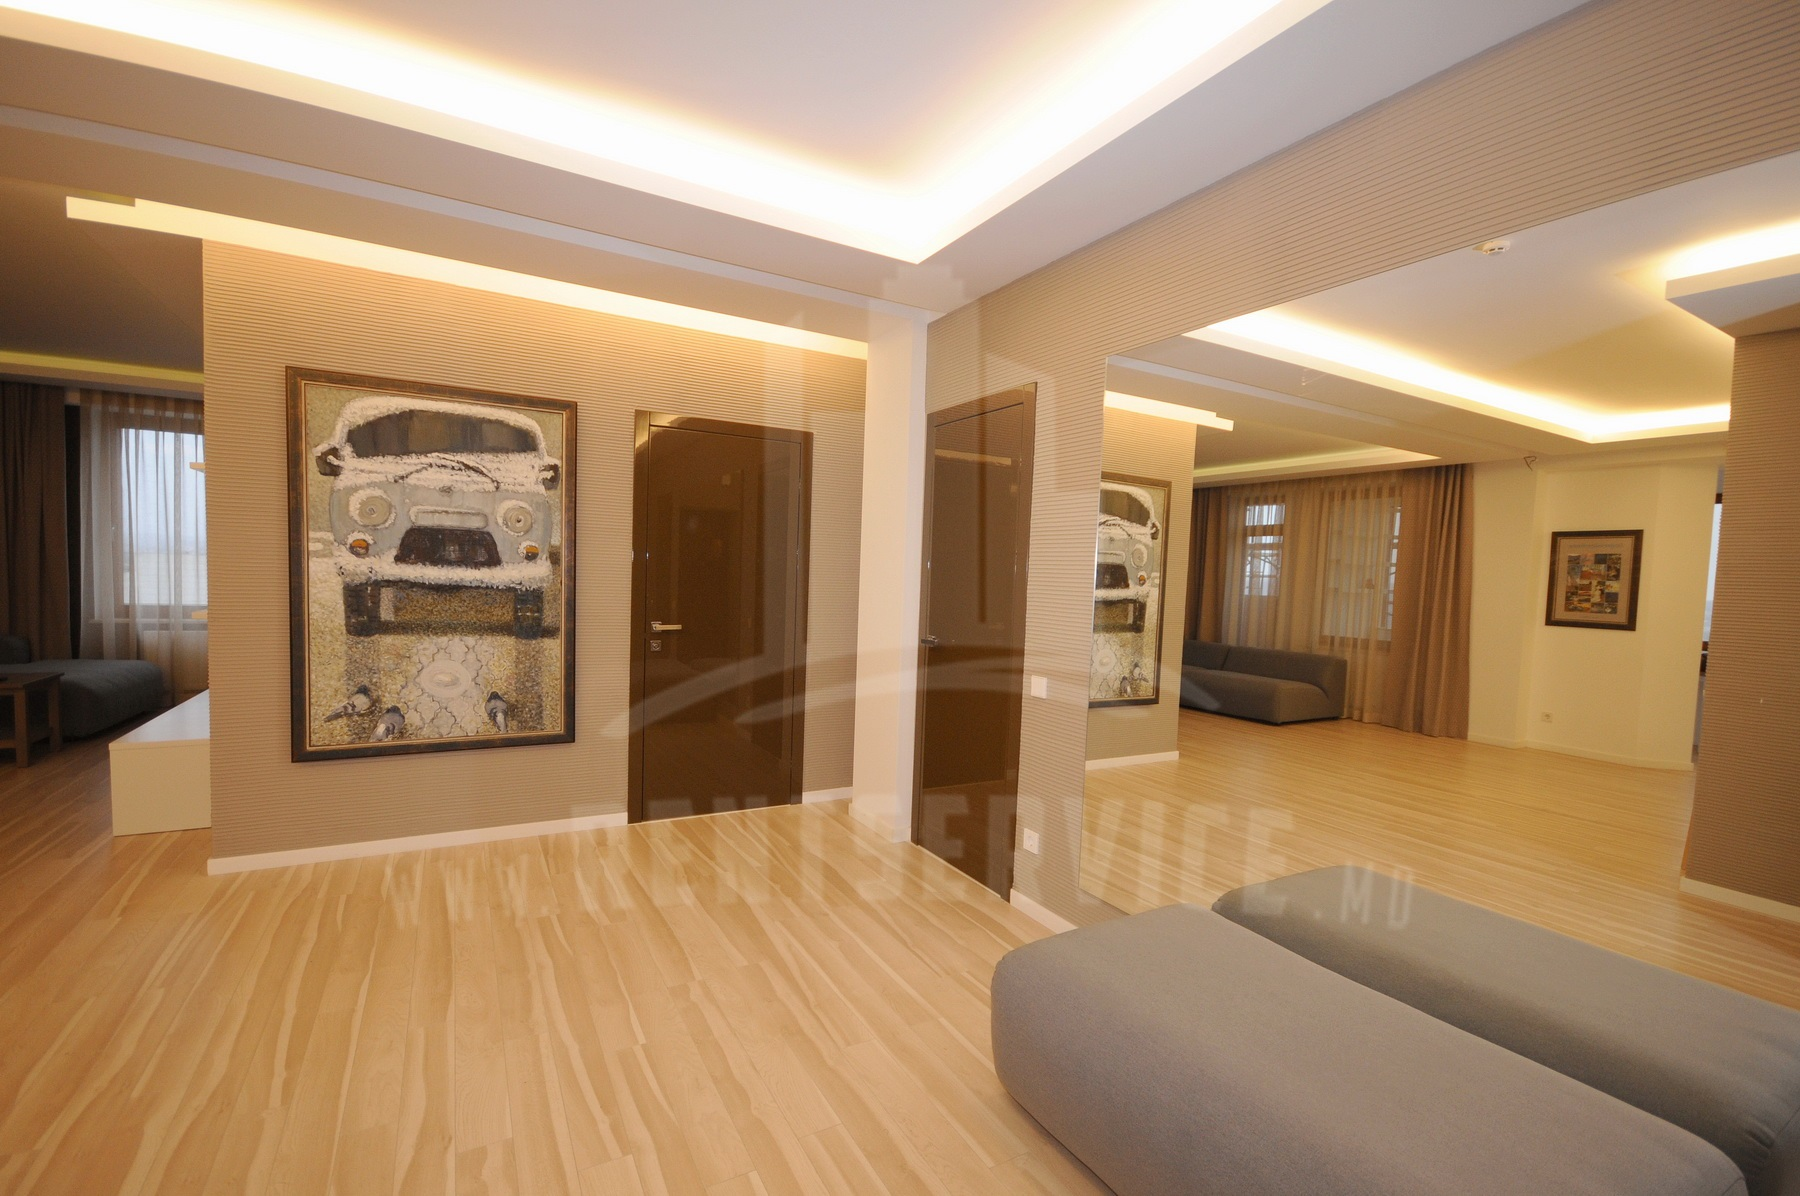 2060_apartment_11.JPG